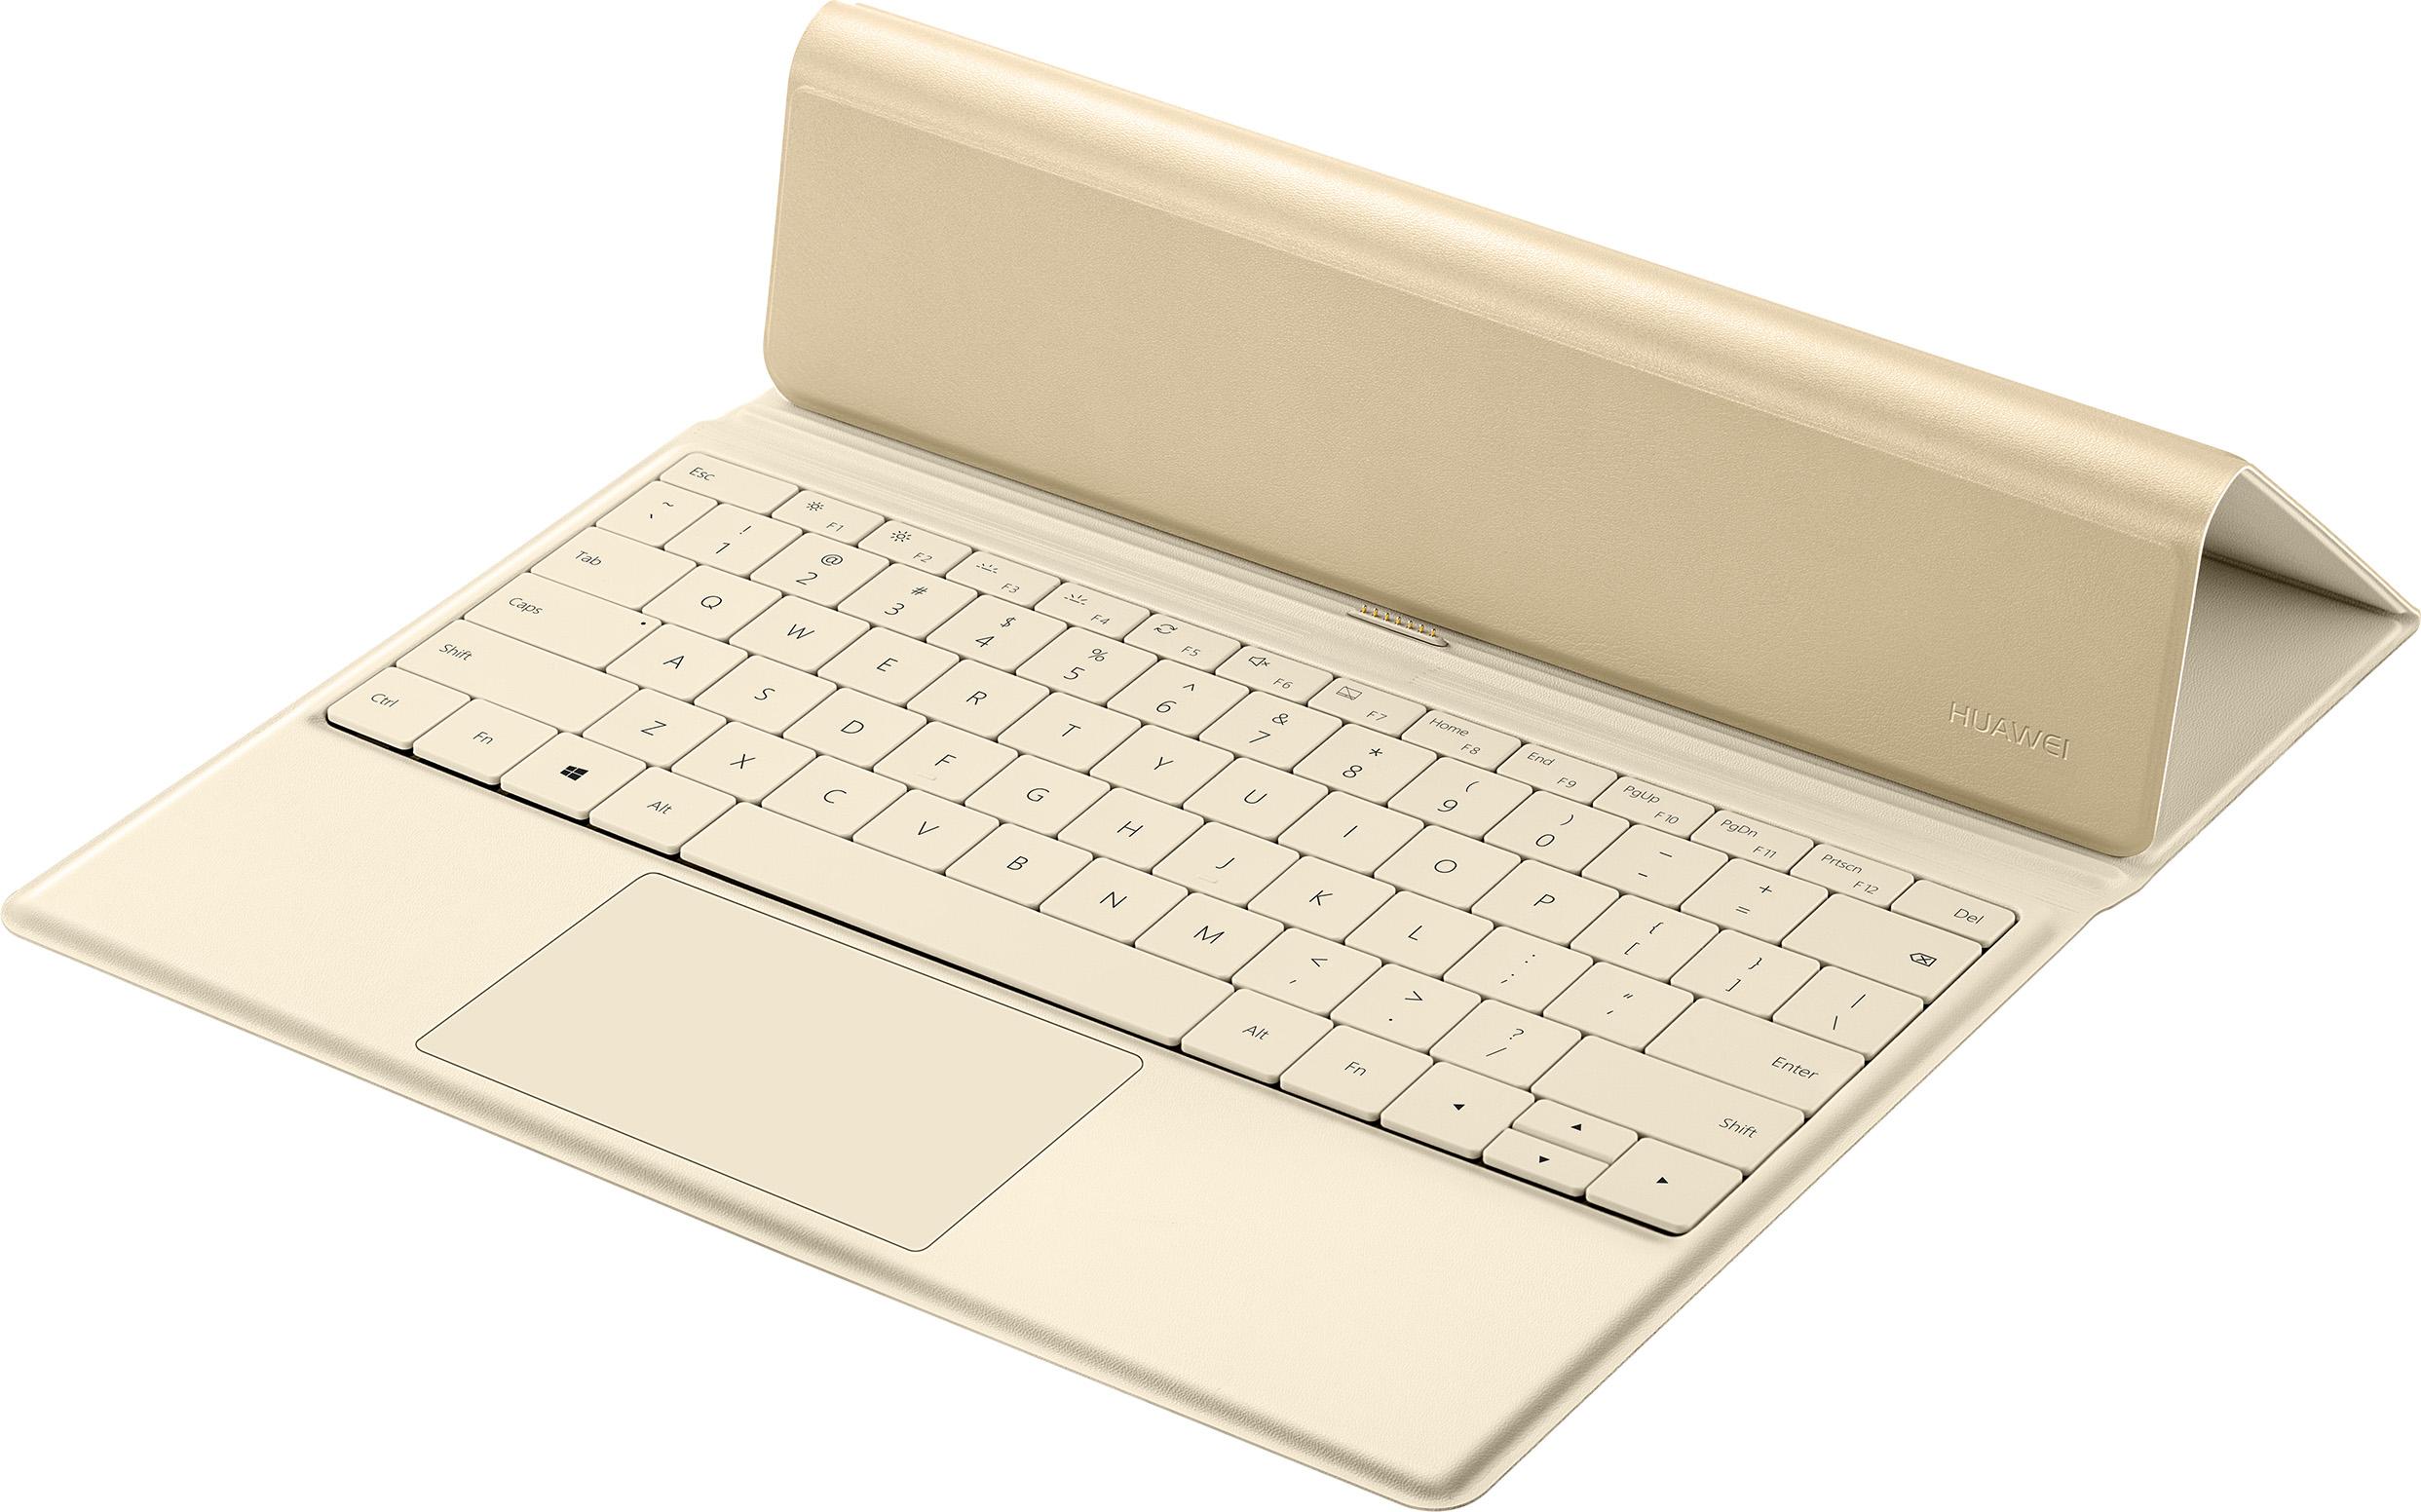 Huawei MateBook Portfolio Keyboard (Beige) Deal